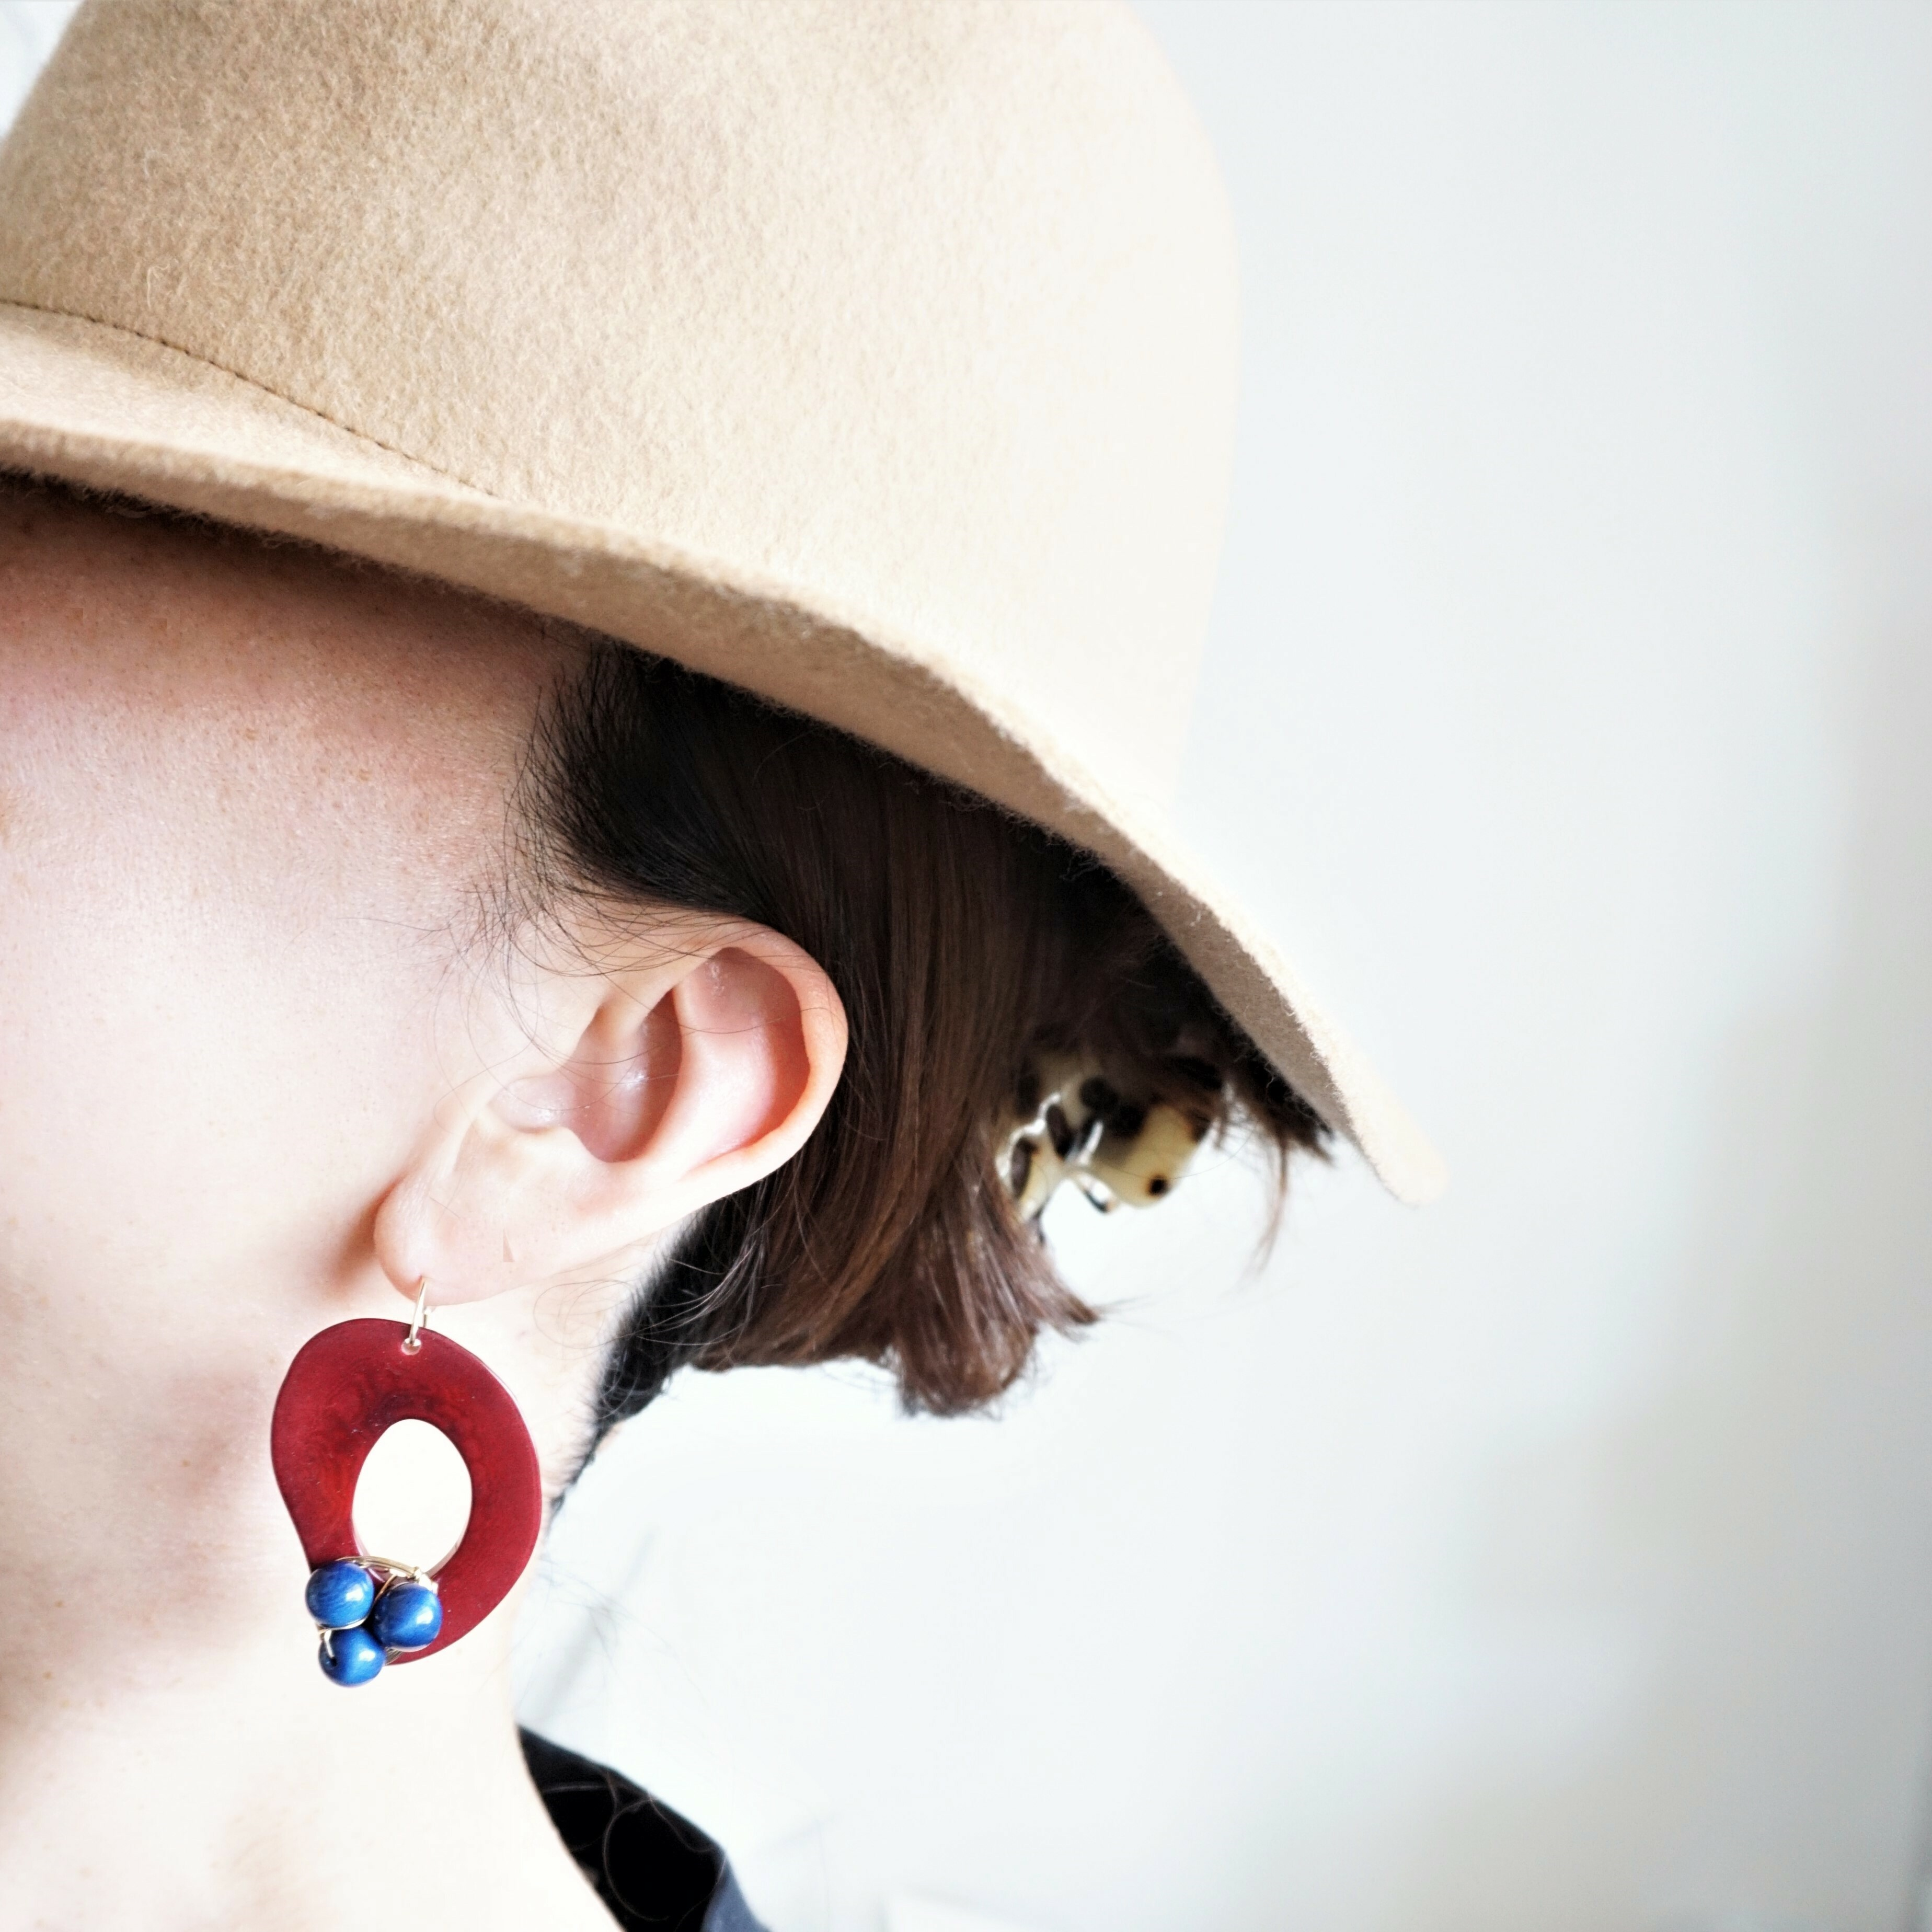 送料無料14kgf*Wine x Navy Tagua Nuts pierced earring / earring